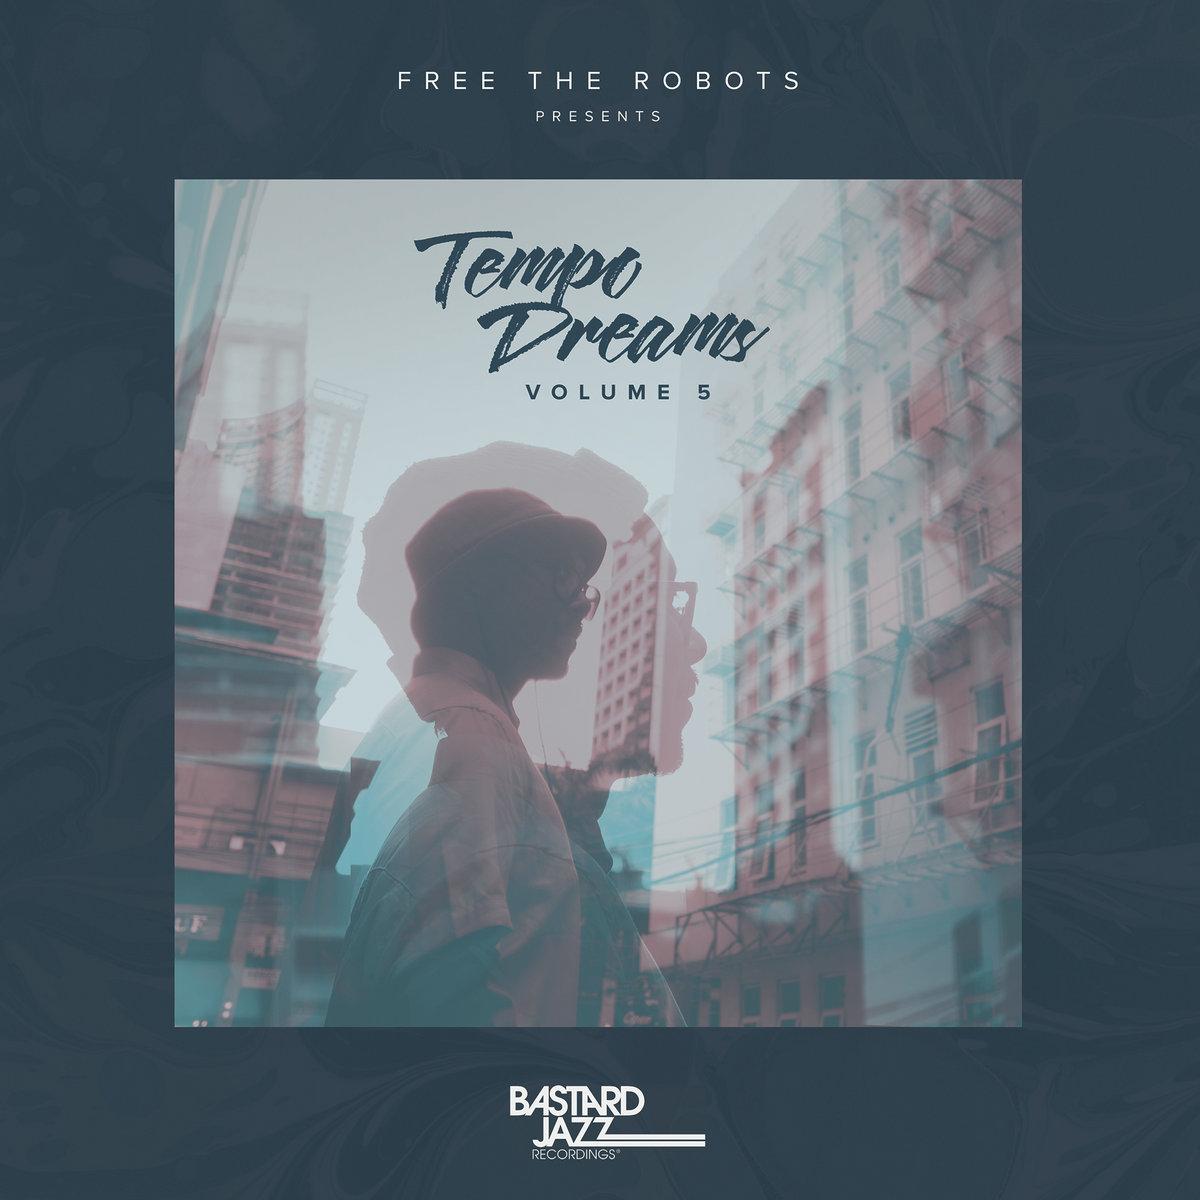 e83c94c8d387 Free The Robots Presents: Tempo Dreams, Vol. 5 | Bastard Jazz Recordings